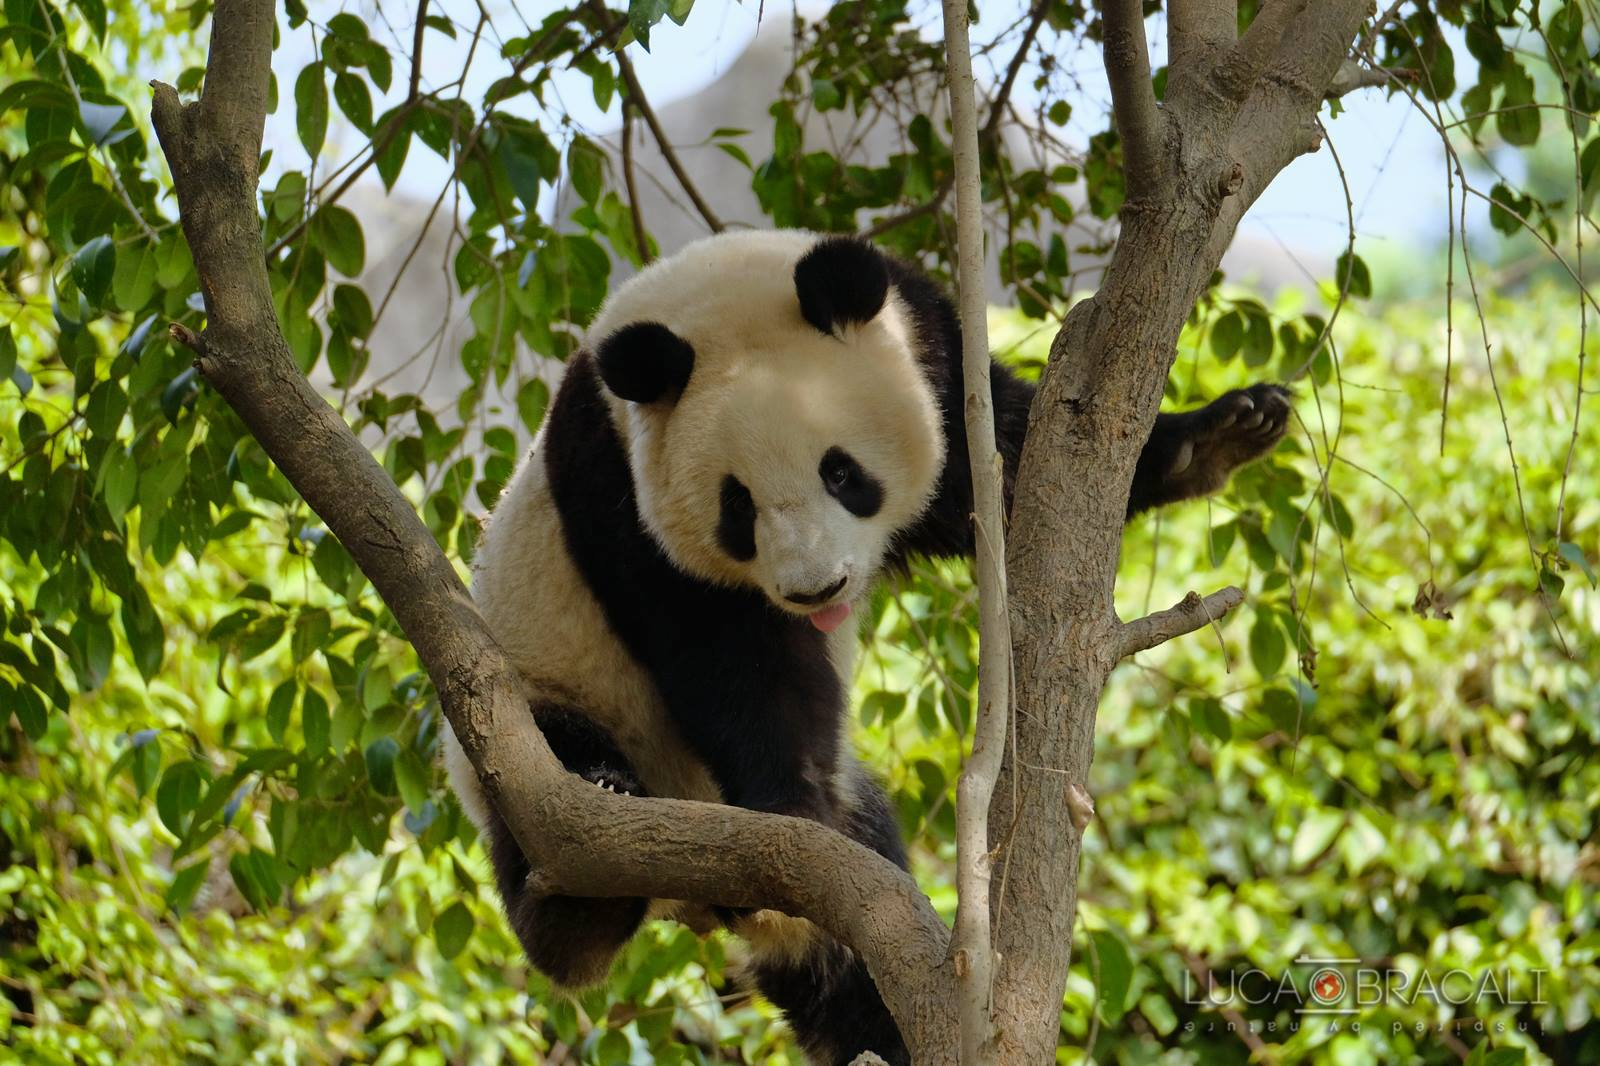 Viaggio fotografico in Cina_Panada1